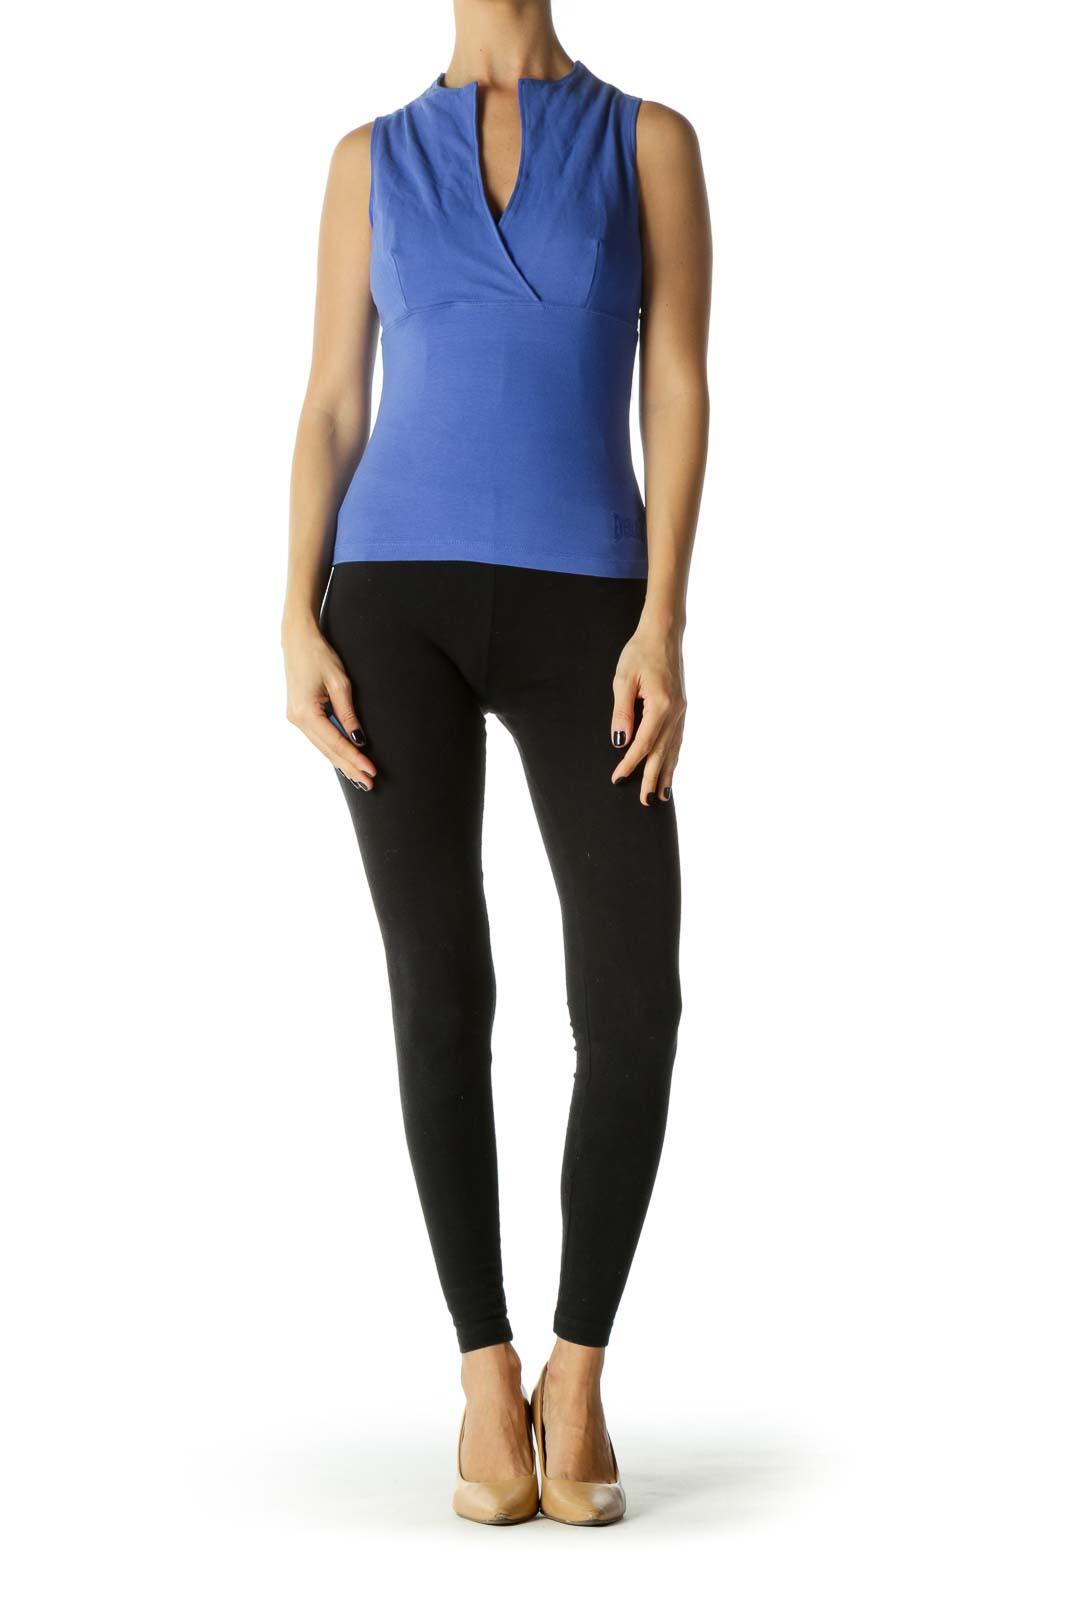 Blue V-neck Sleeveless Yoga Top